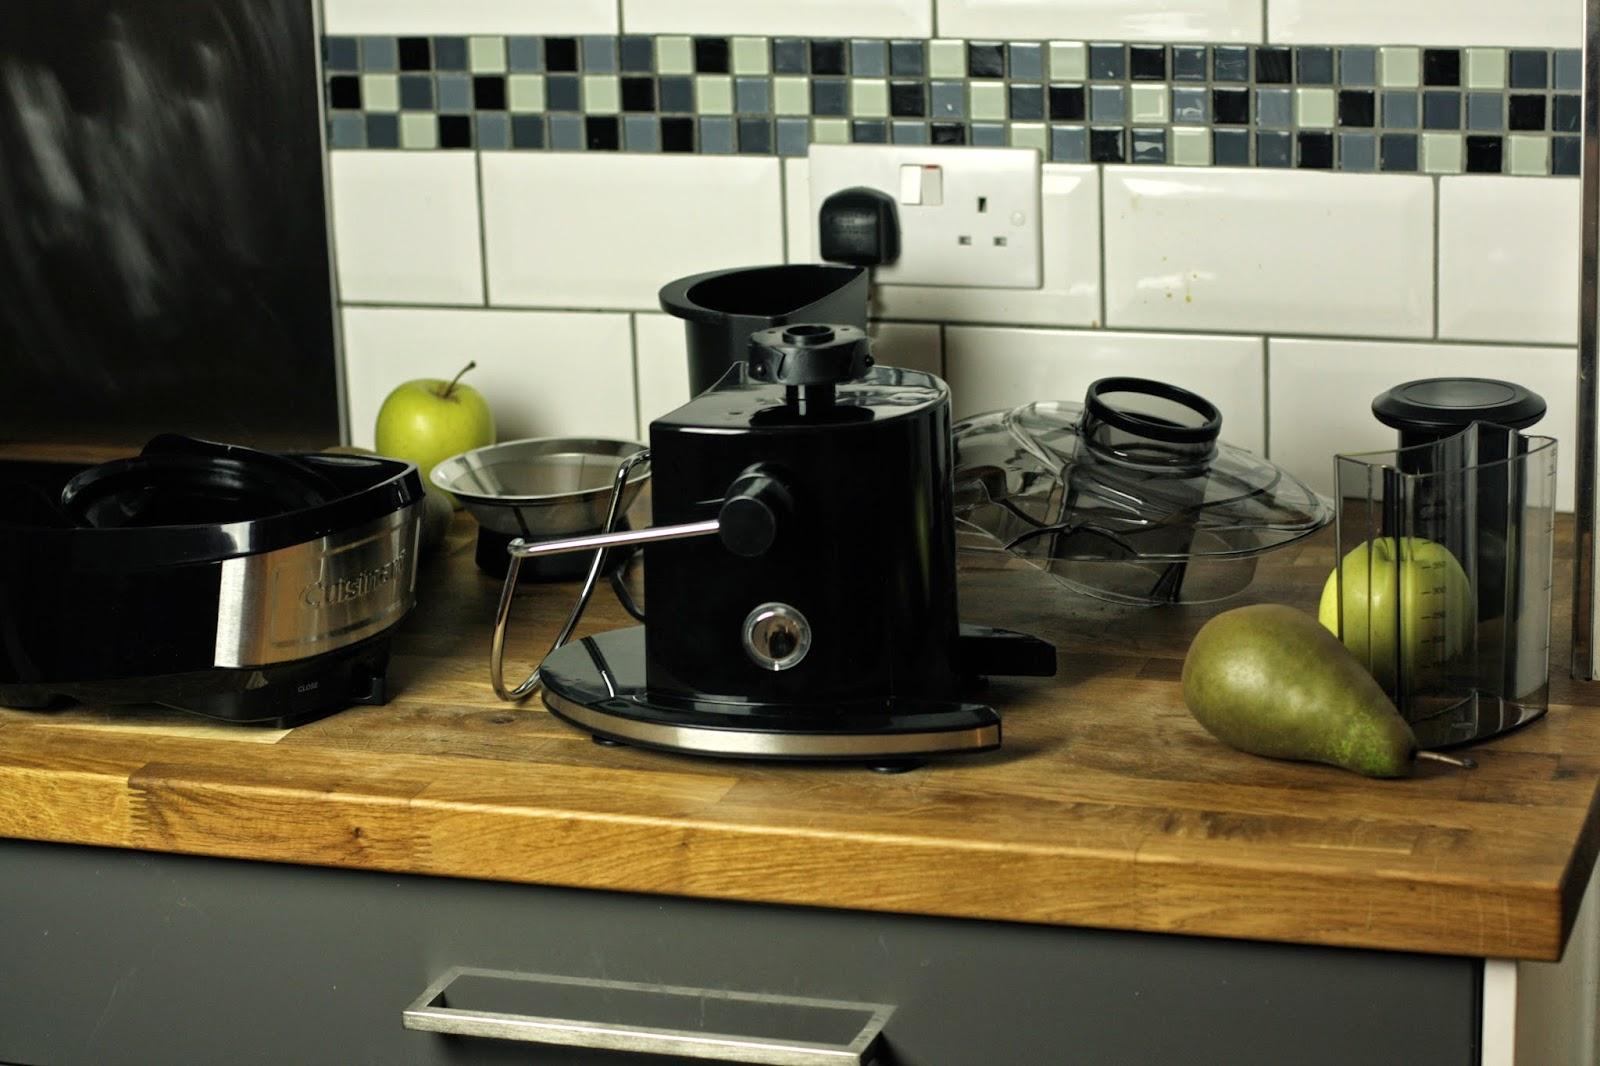 Cuisinart Compact Juice Maker's Parts